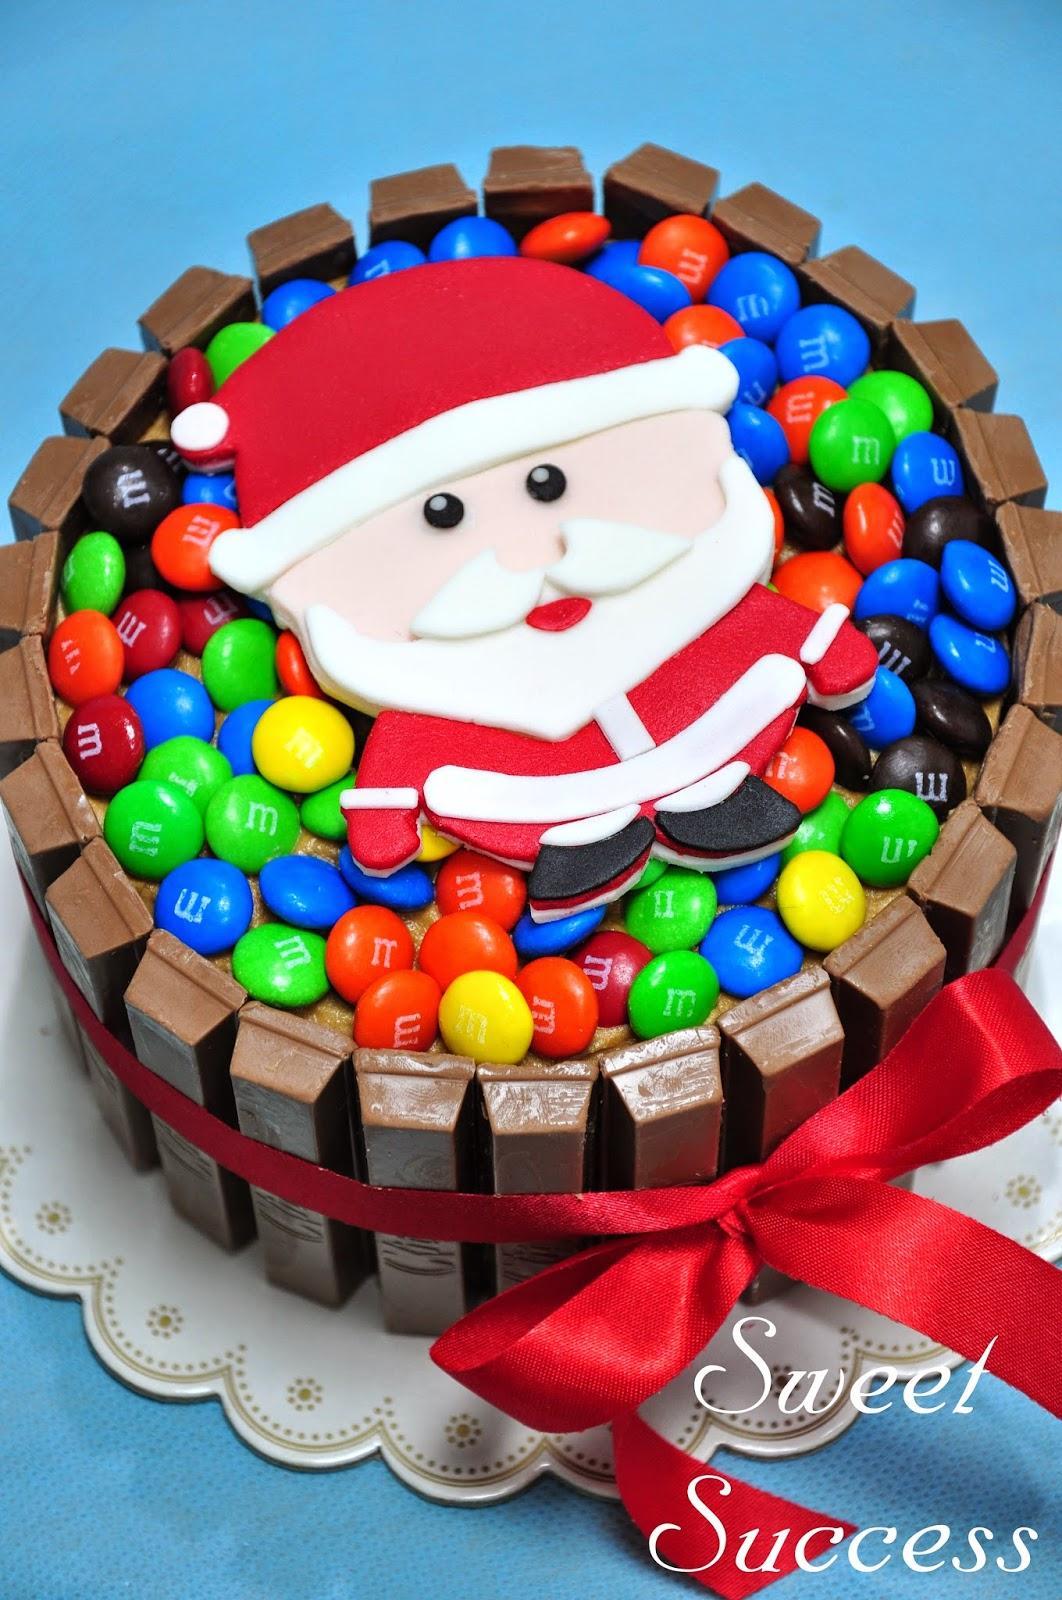 Sweet Success\' Sweet Life: Christmas KitKat and M&M Cake